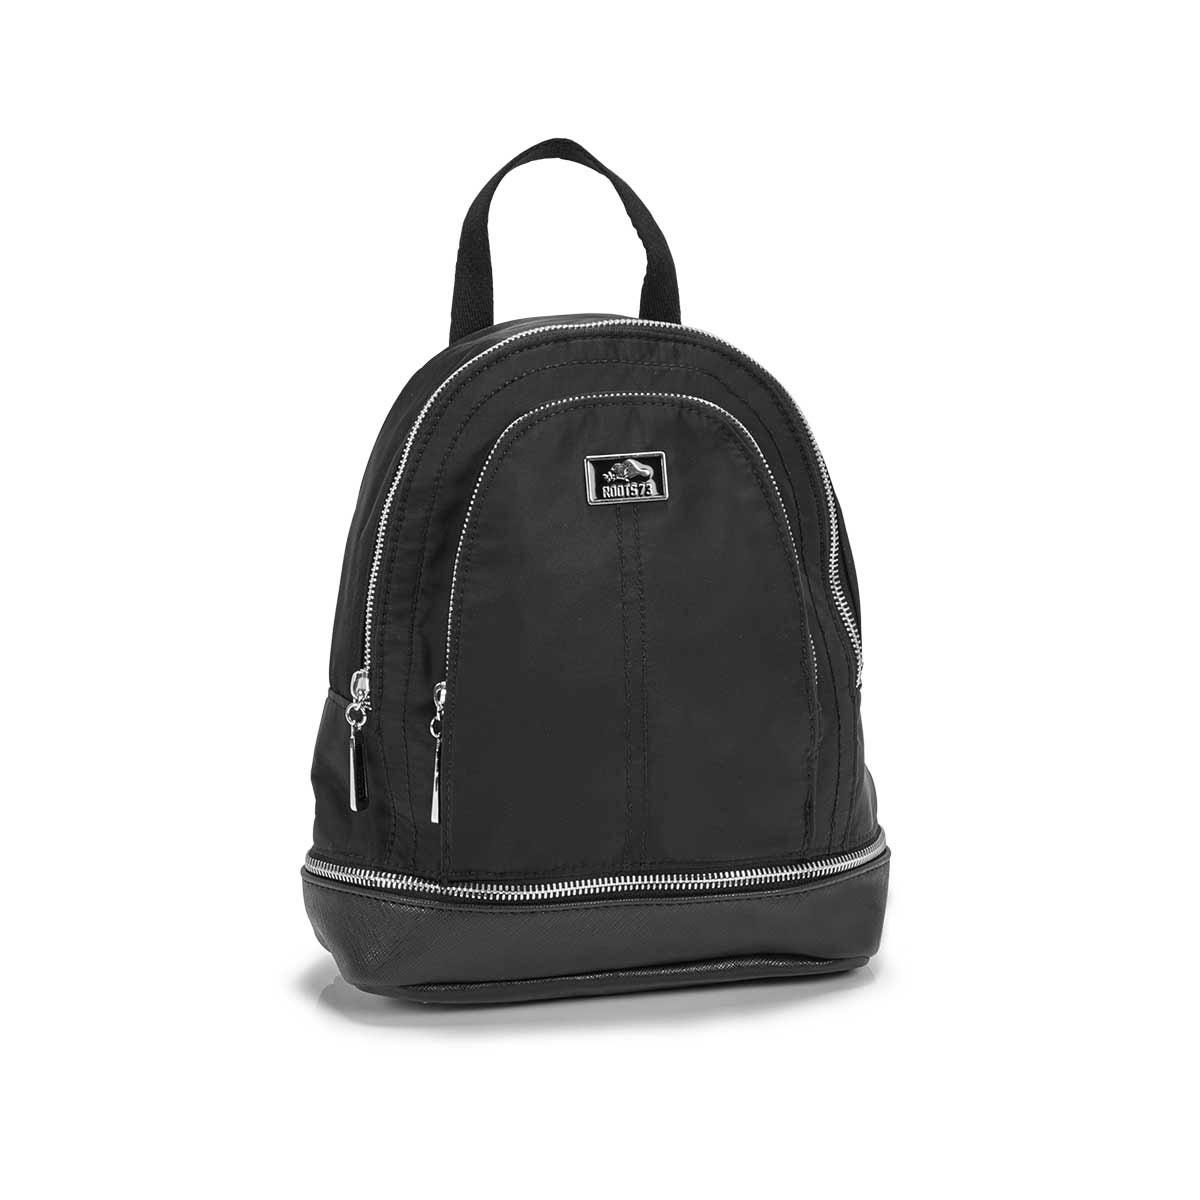 Women's R5401 black mini backpack